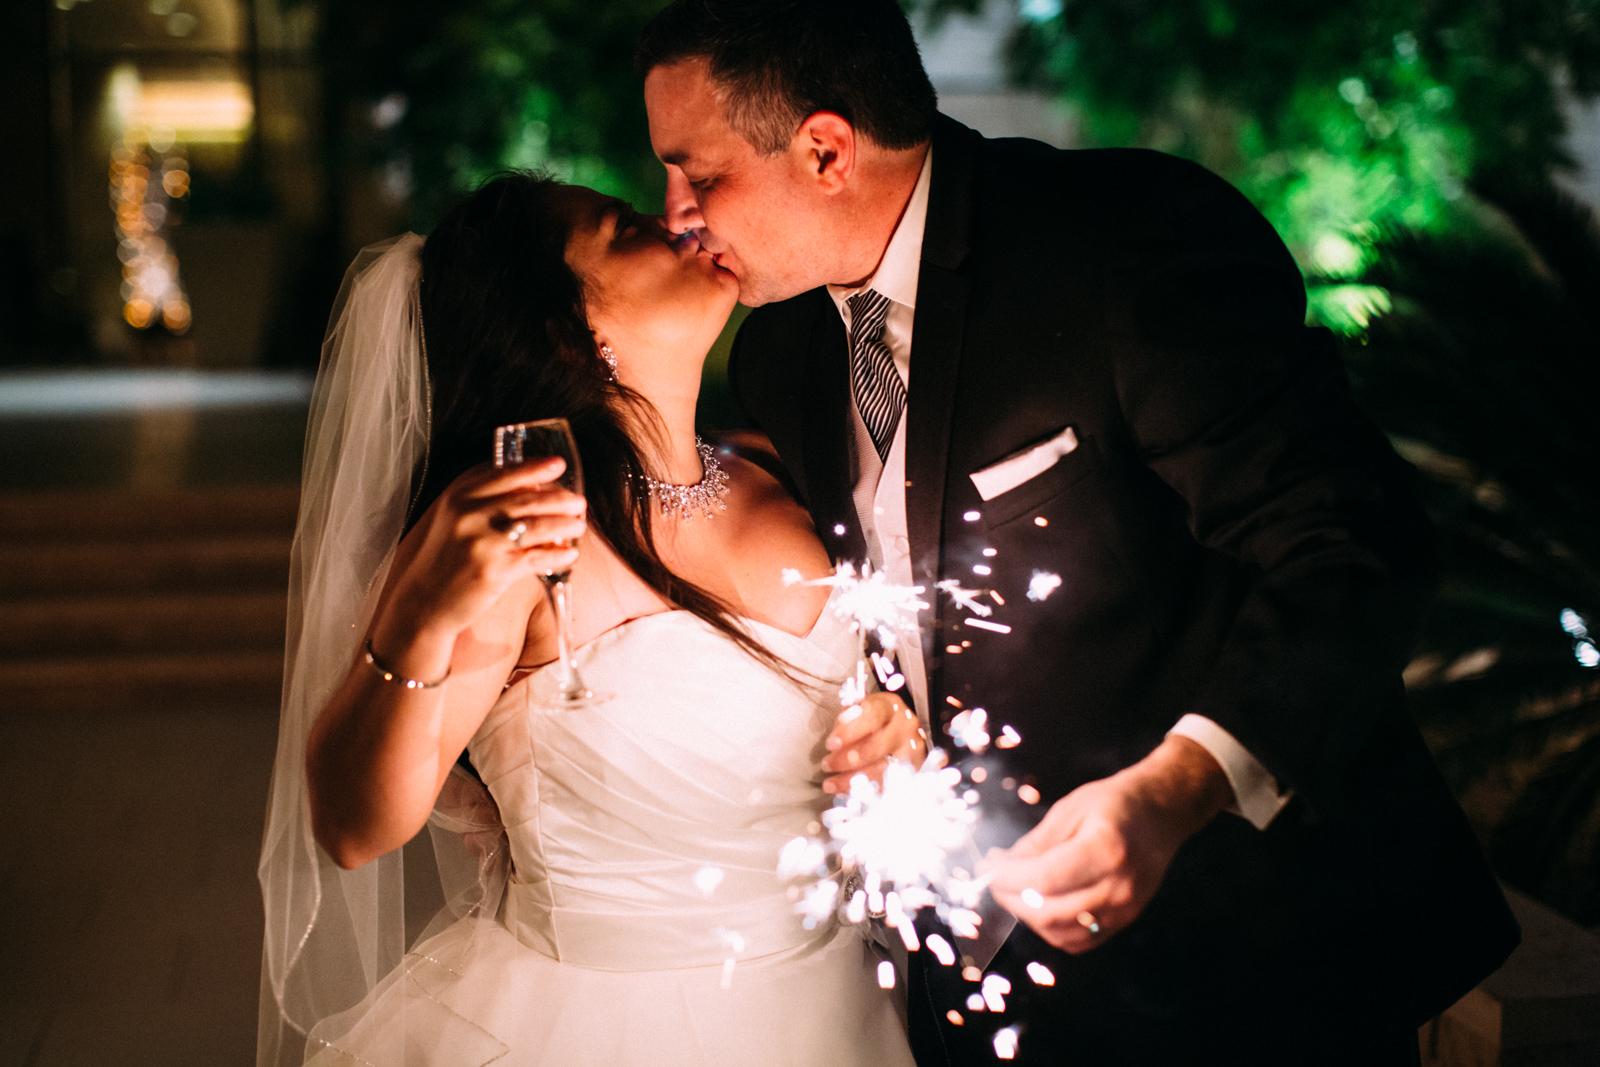 #weddingplannerlasvegas,#lasvegasweddingcoordinators,#weddingcoordinatorslasvegas,#weddingcoordinatorlasvegas,#lasvegasweddingplanner #desirableeventsbydesi #Tropicanawedding #wedding, #love, #lovewins, #samesexwedding, #gaywedding, #tropicana, #lasvegaswedding, #weddinglasvegas, #weddingplannerslasvegas, #lasvegasweddingplanners, #worldmarketcenter, #susieandwill, #elegantwedding, #myloandshino, #lasvegas, #weddingslv, #lvweddingplanners, #mresort, #mresortwedding, #mcasino, #suitewedding, #newyearseveweddinglasvegas, newyearsevelasvegas, newyearseve, nyewedding